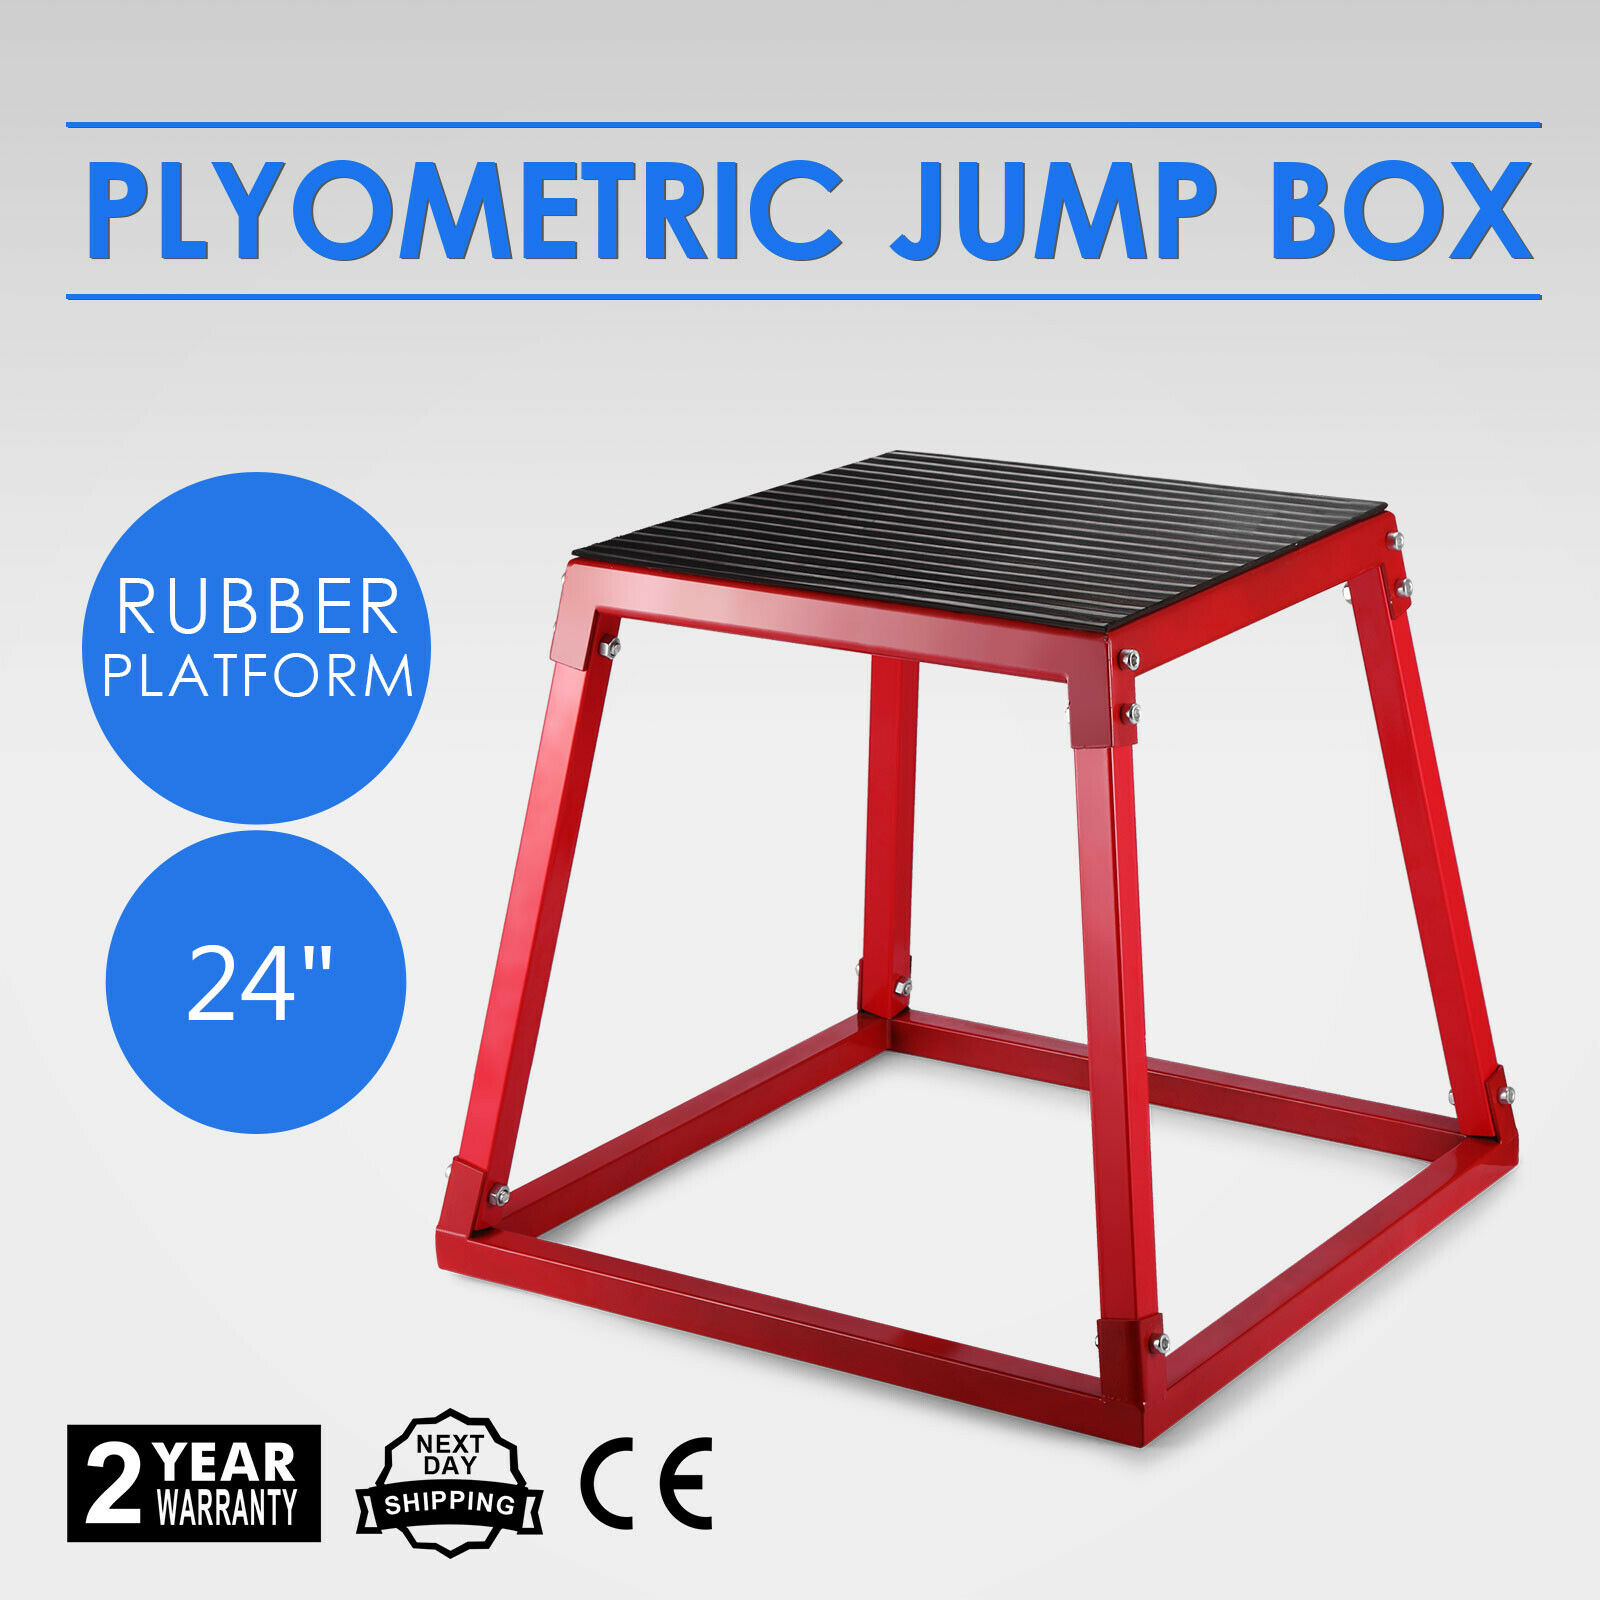 60cm Fitness Exercise Jump Plyometric Plyo Box Step Cross Gym Sports Workout